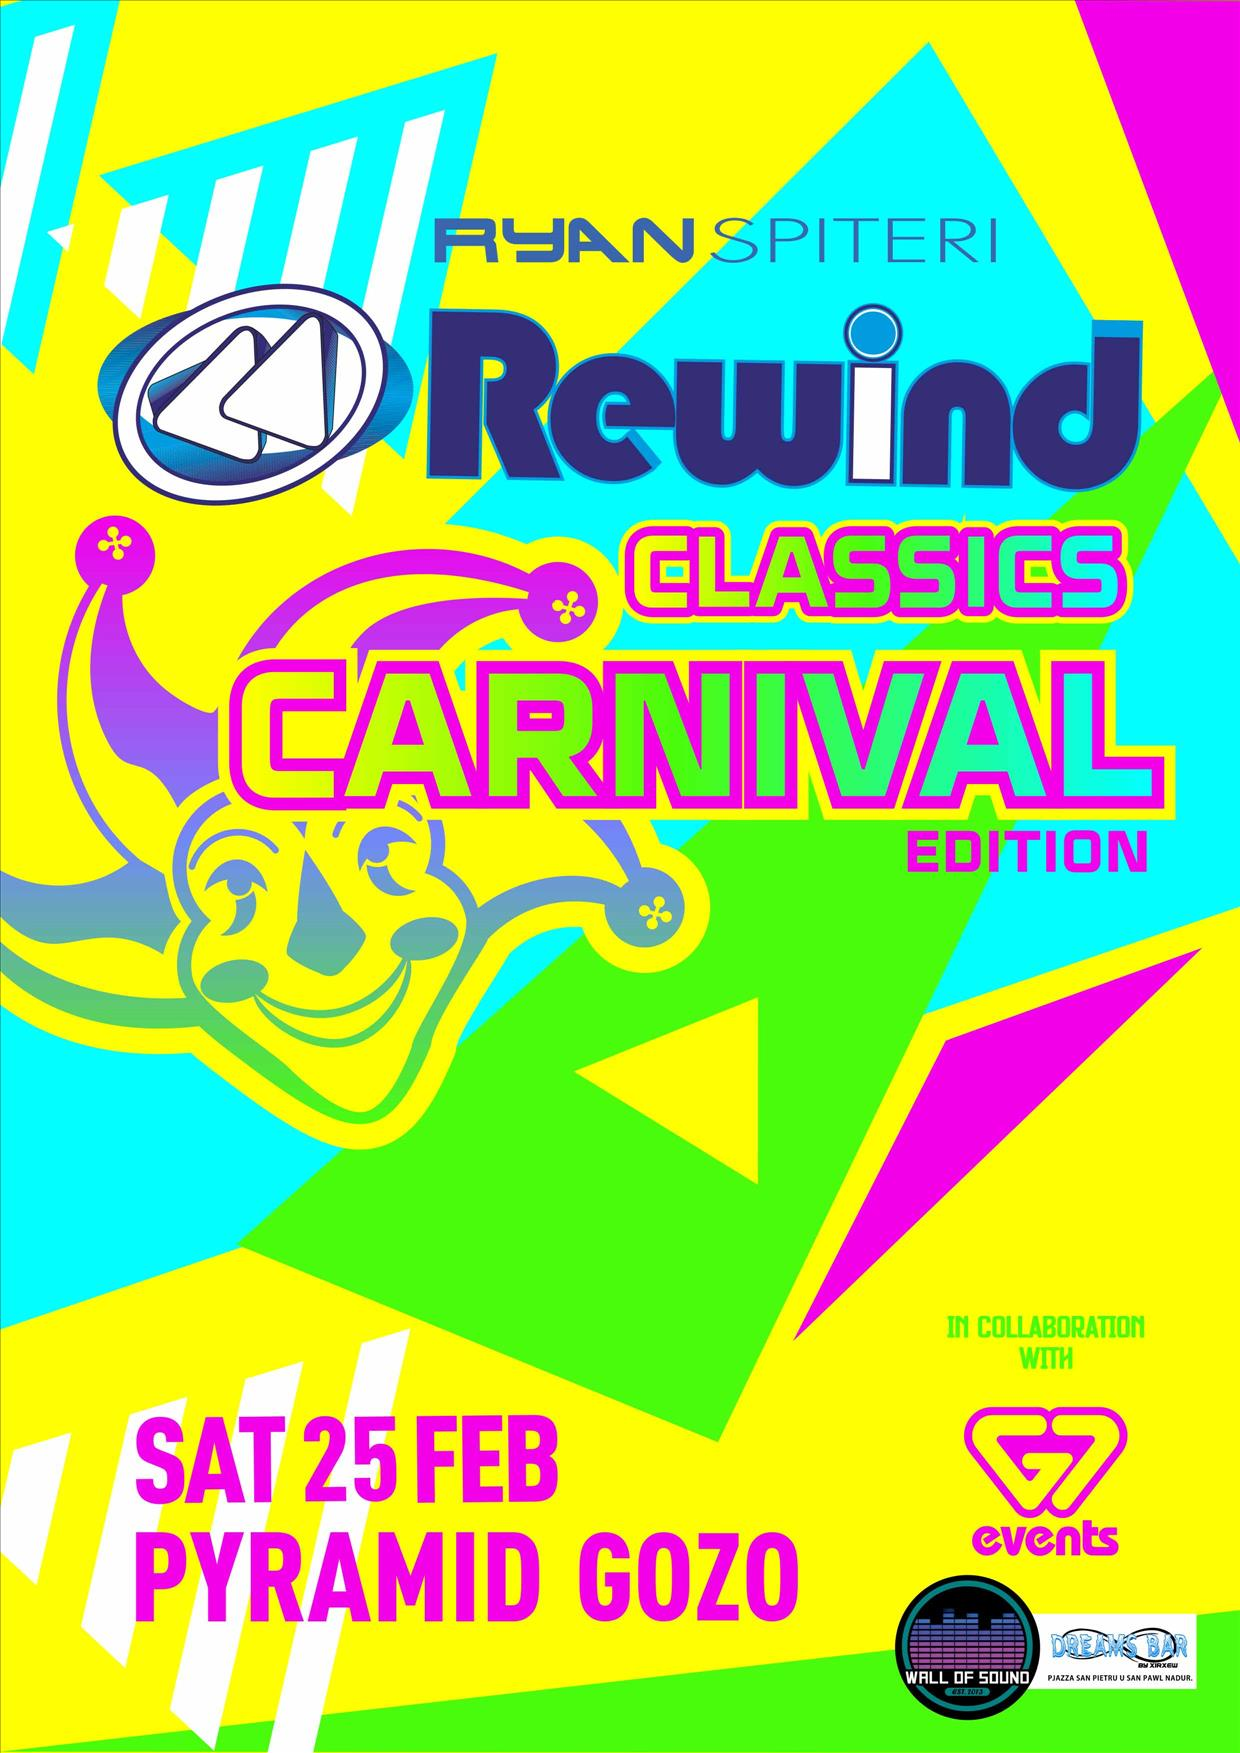 REWIND Classics - Gozo Carnival Edition flyer